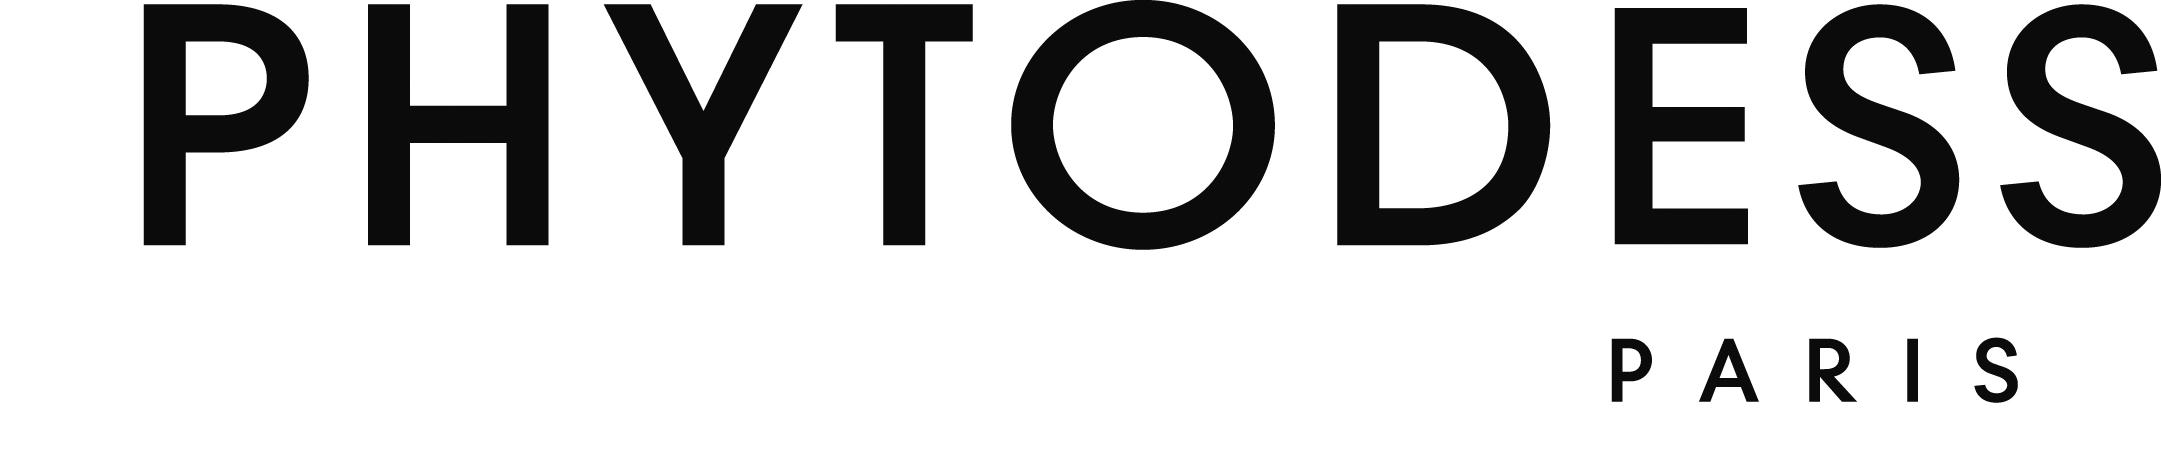 Phytodess Paris : logo